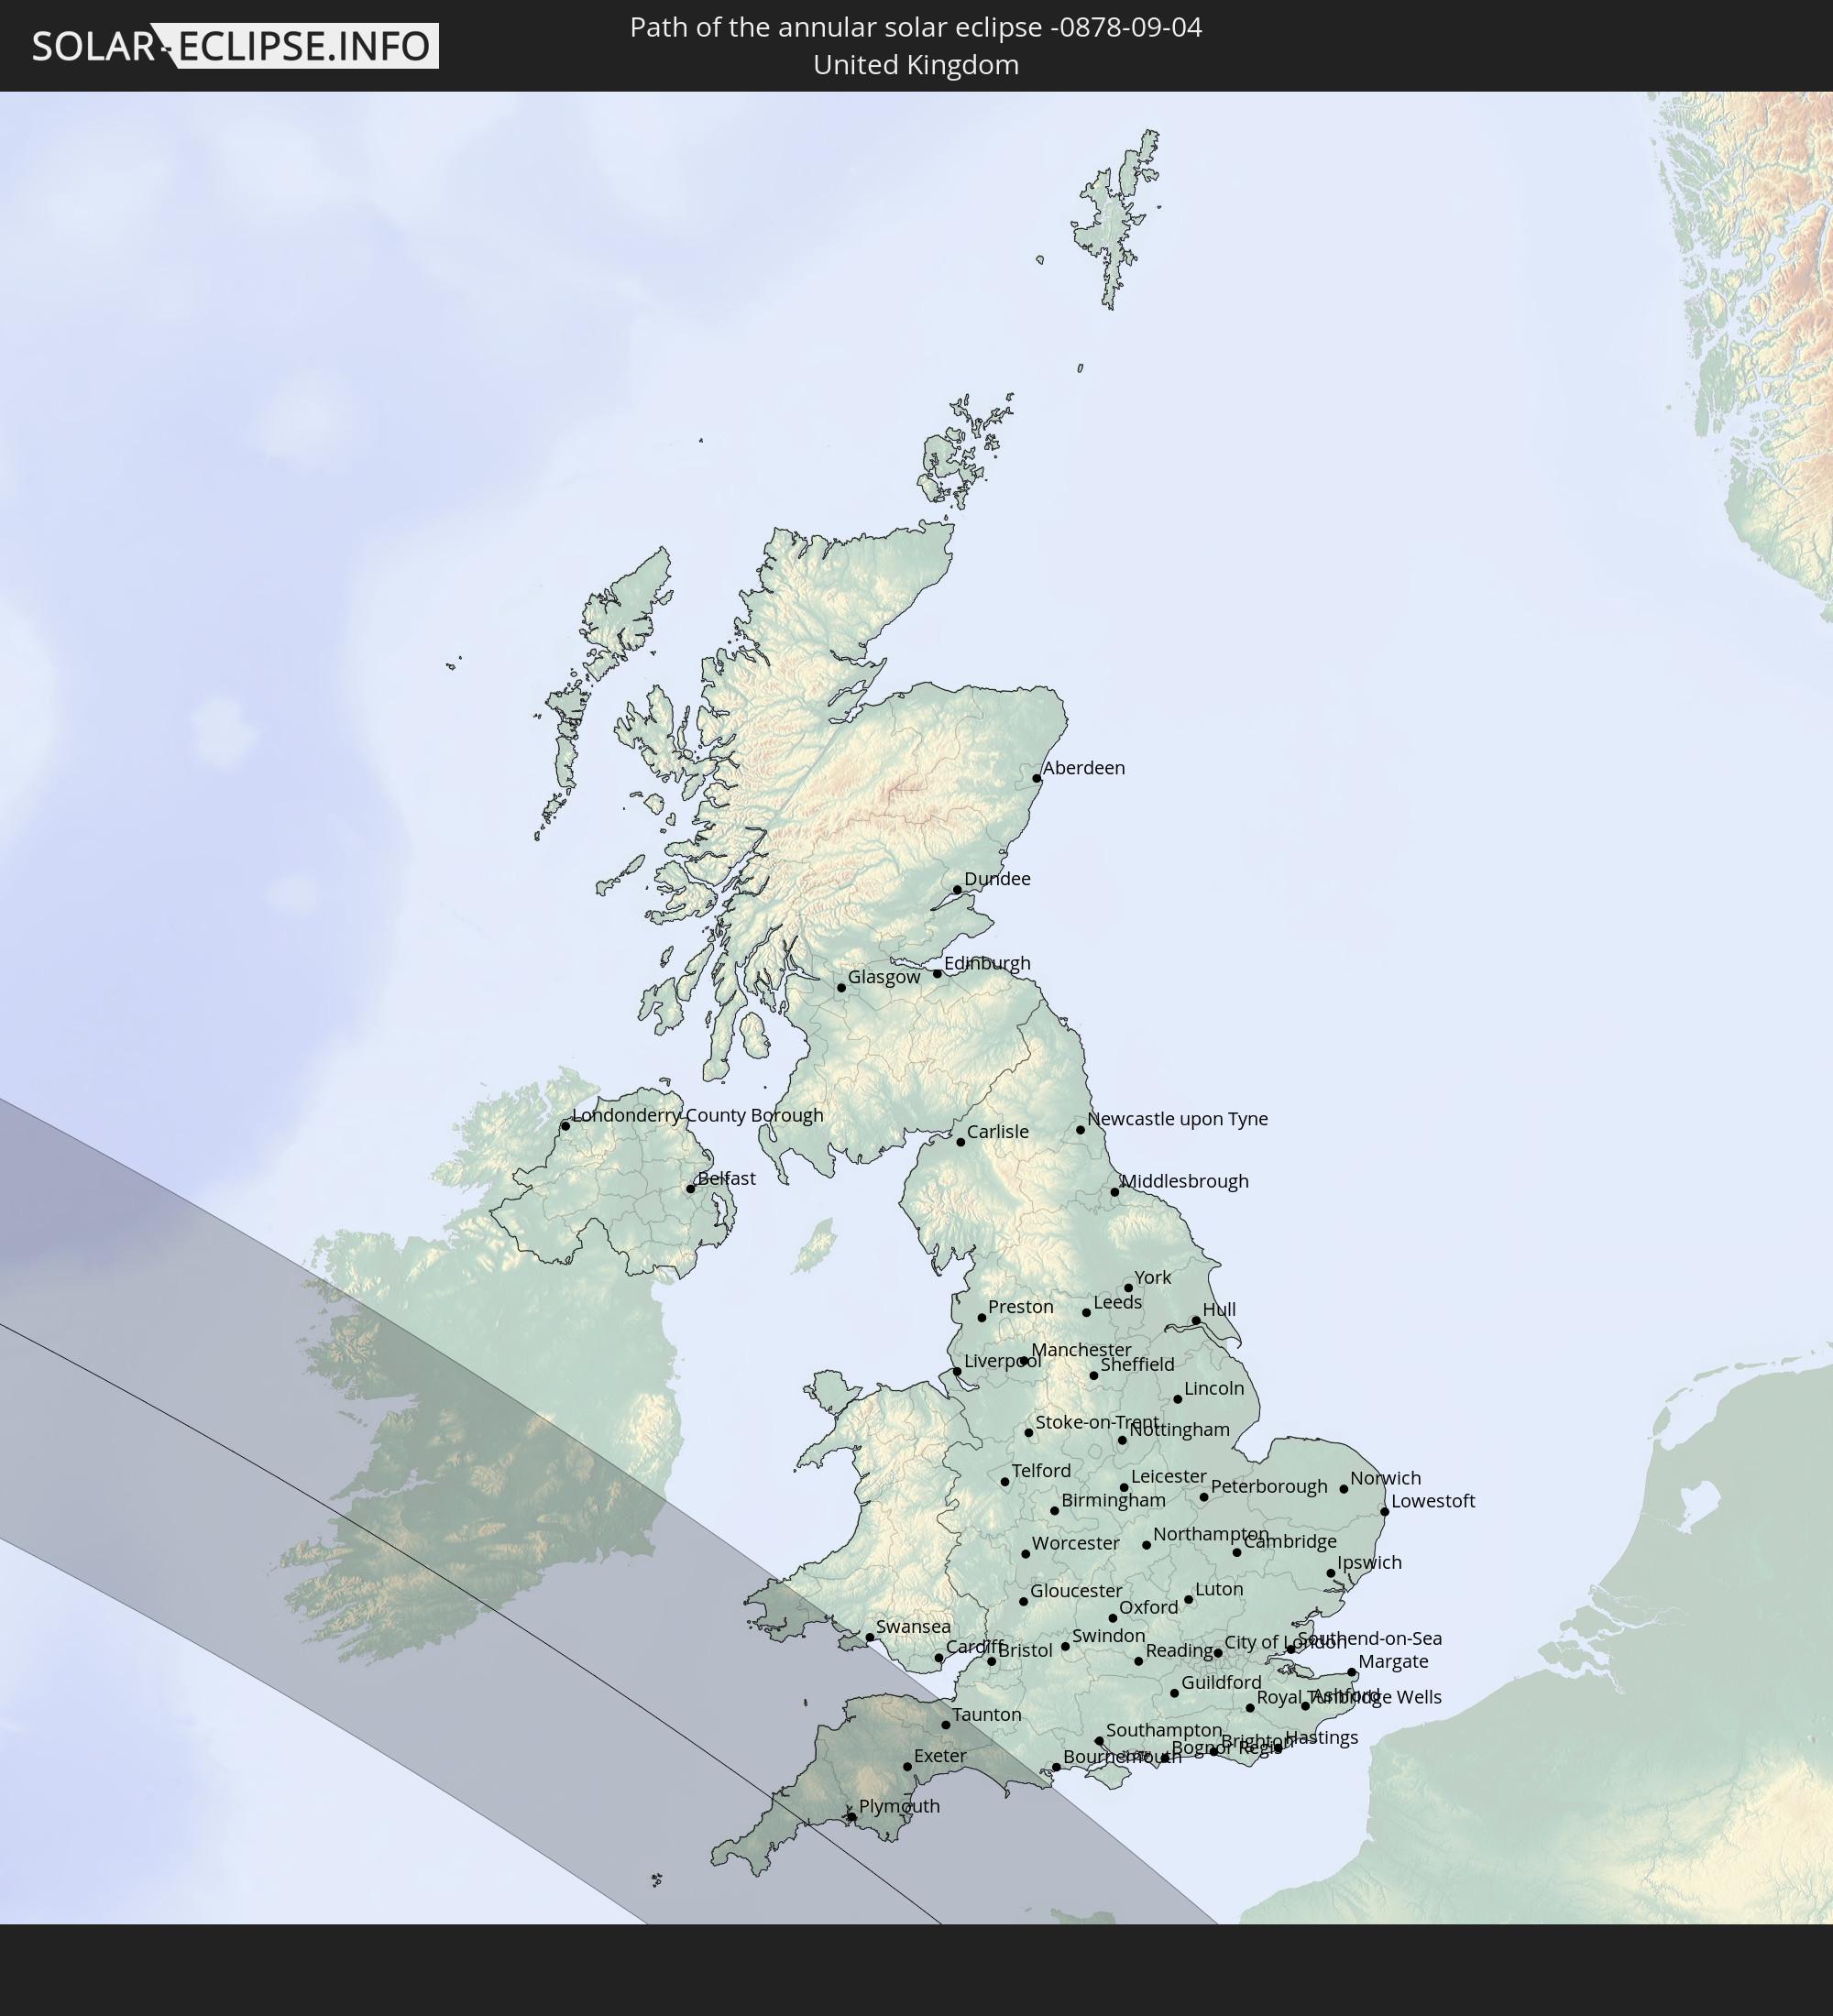 United Kingdom The annular solar eclipse of